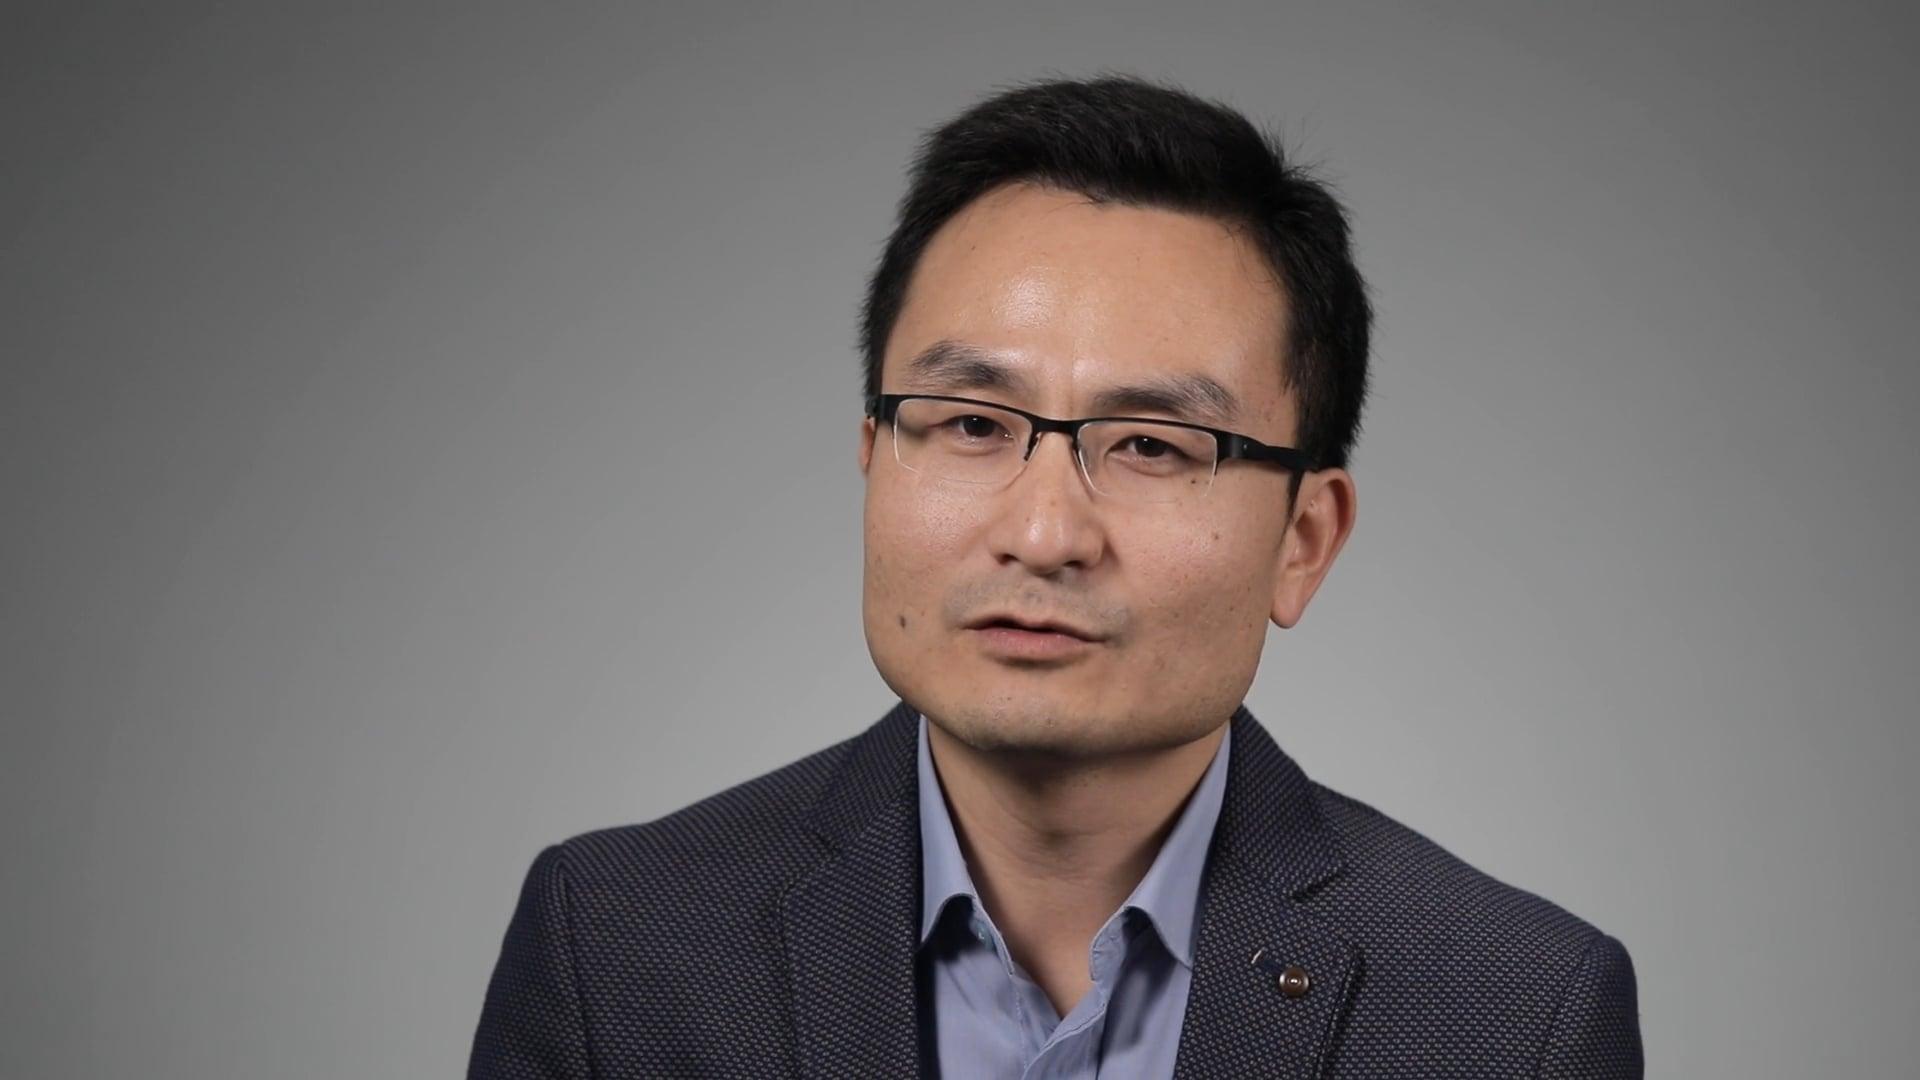 Film: Watch a film about Yaowen Wu's research